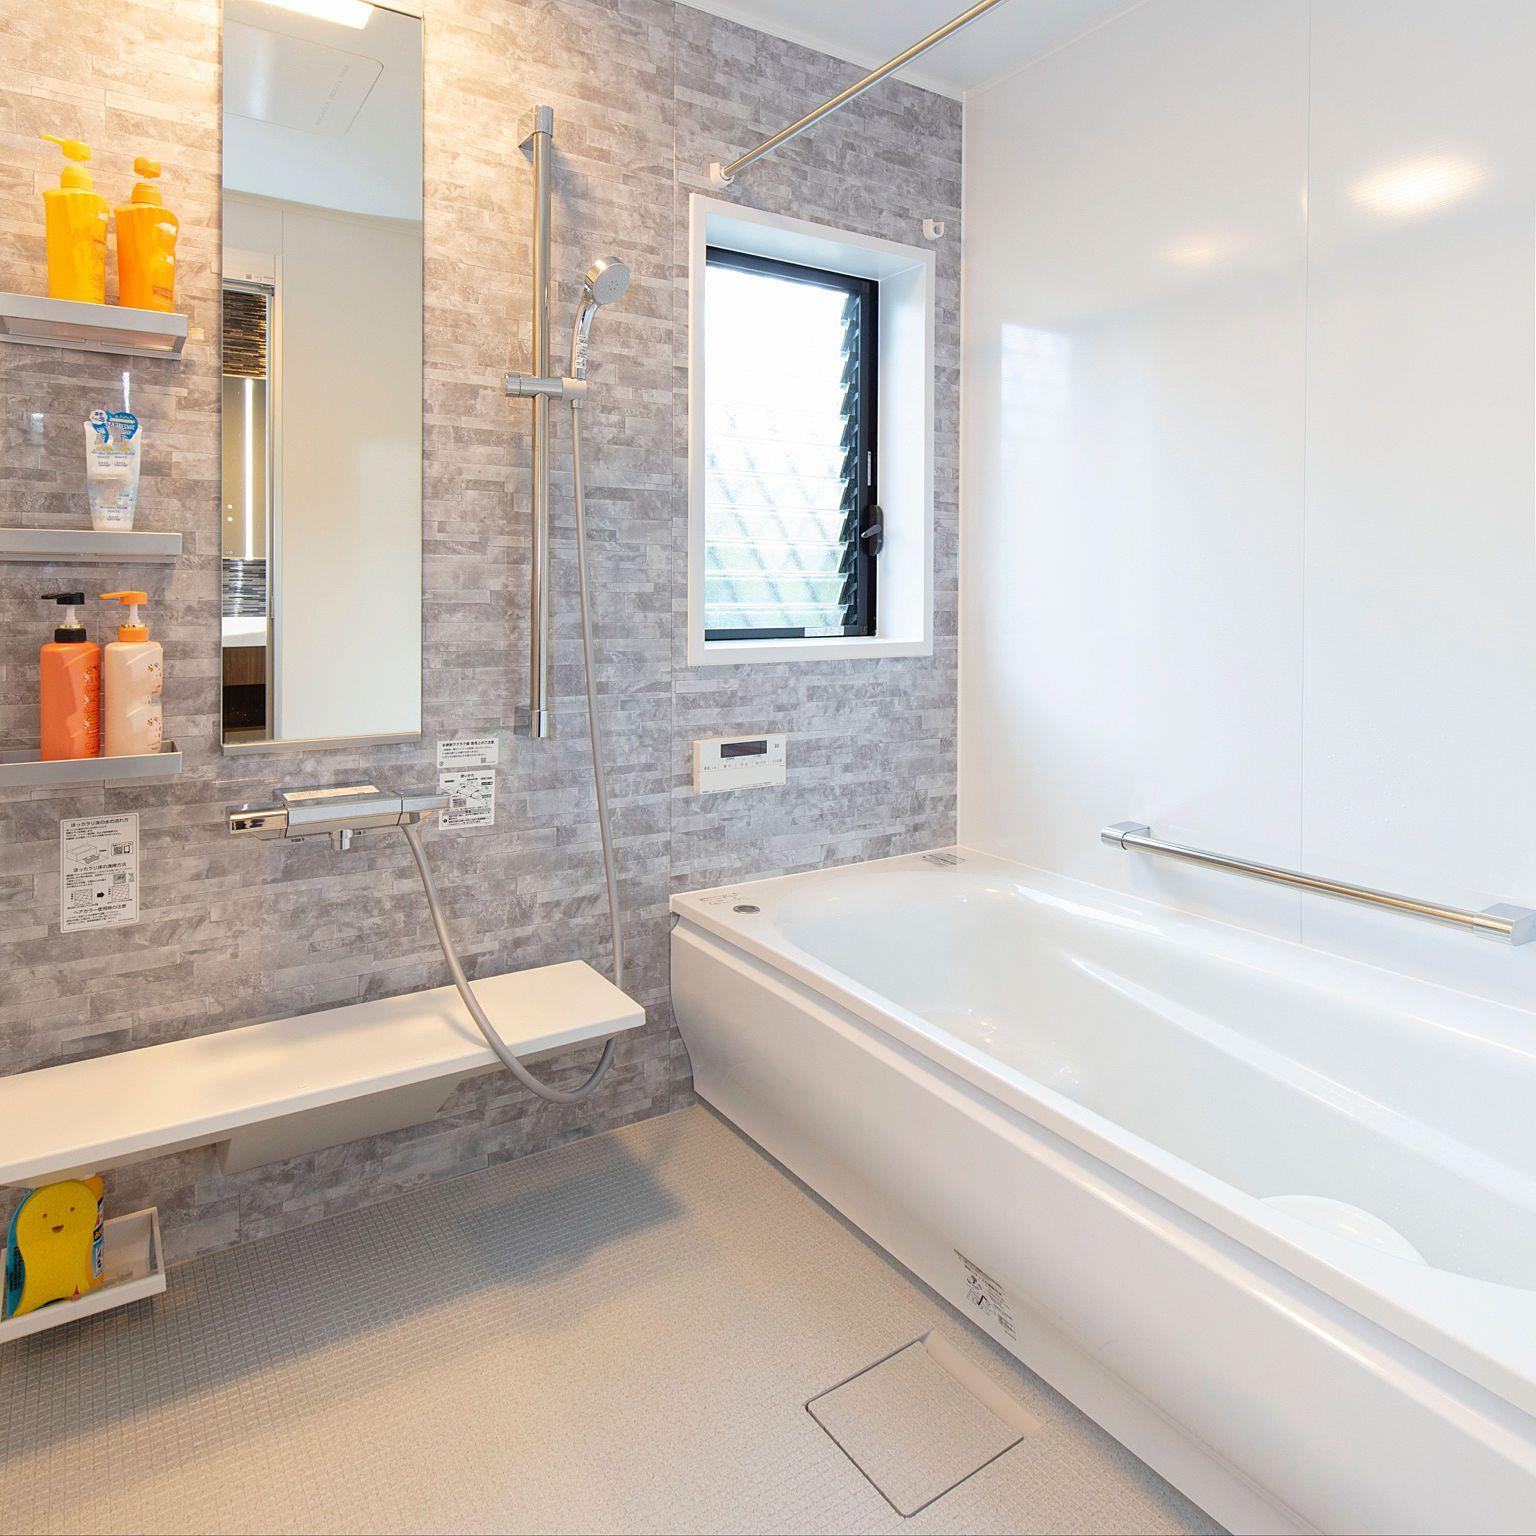 Lixil浴室折戸の交換 旧トステム中折ドアme型 小山市it様邸 お風呂 リフォーム ドアリフォーム 折戸